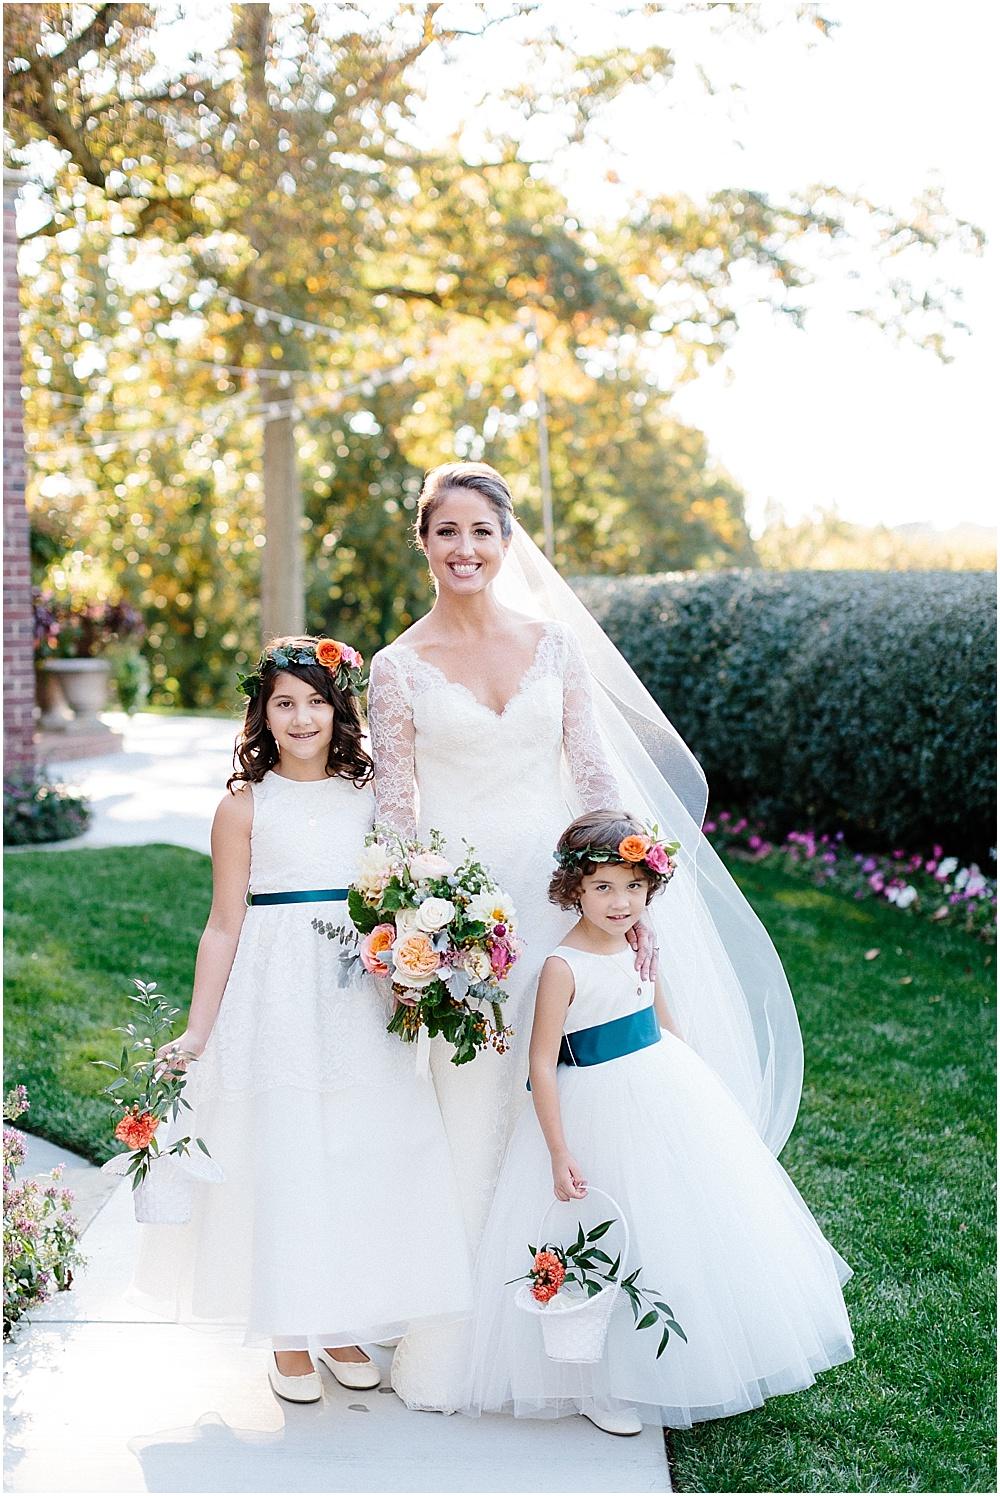 Vane_Baltimore_Country_Club_Wedding_Baltimore_Wedding_Photographer_0046